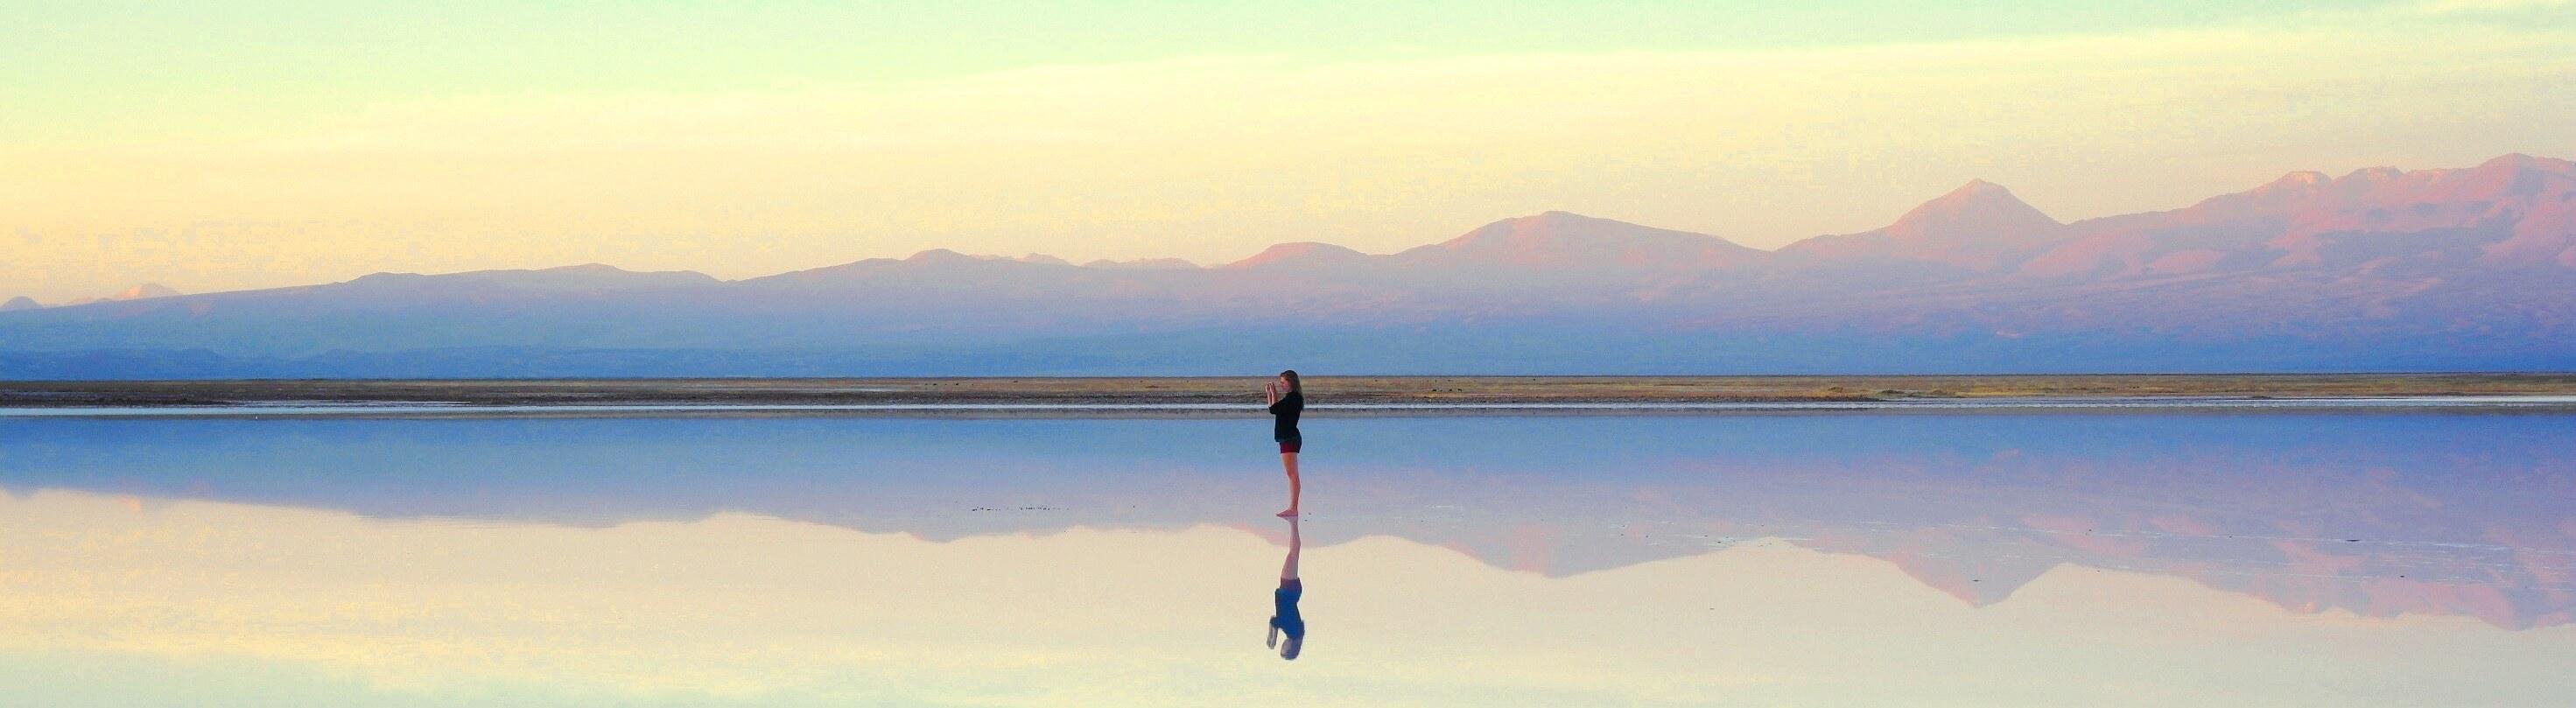 reflections banner - pepe-reyes-163878-unsplash